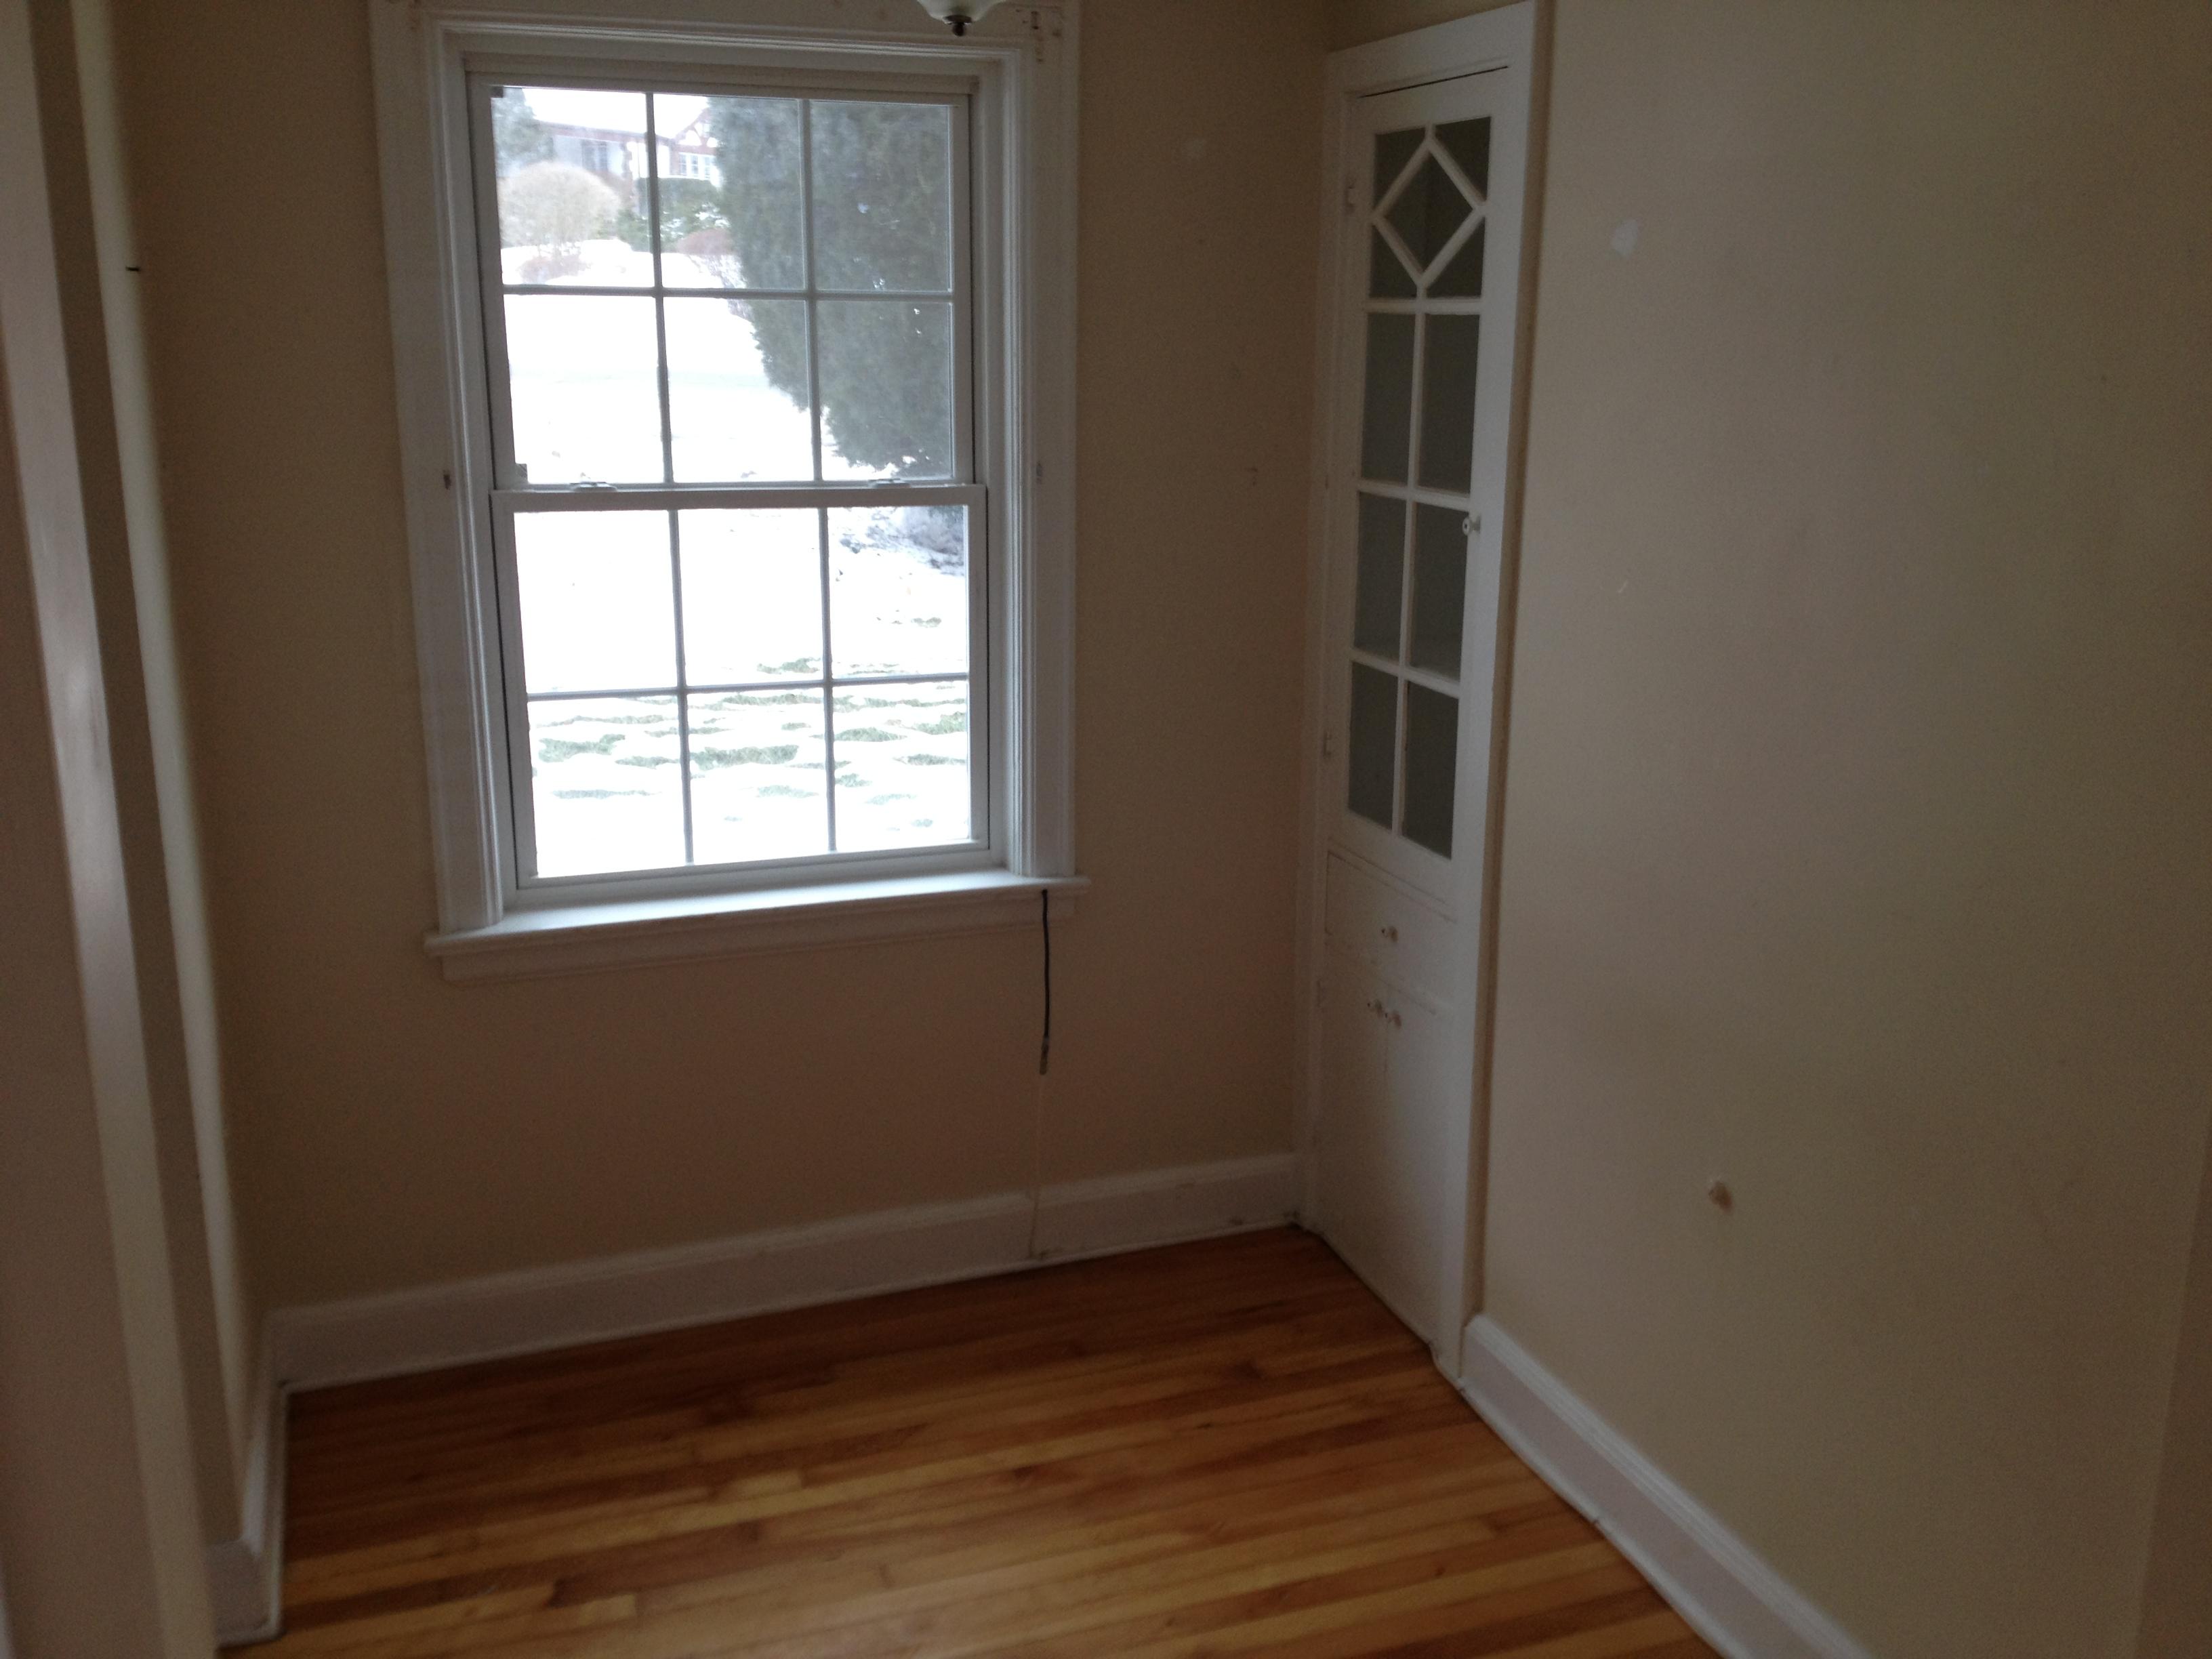 100 750 Sq Ft Apartment 338 Sq Ft Tiny Home